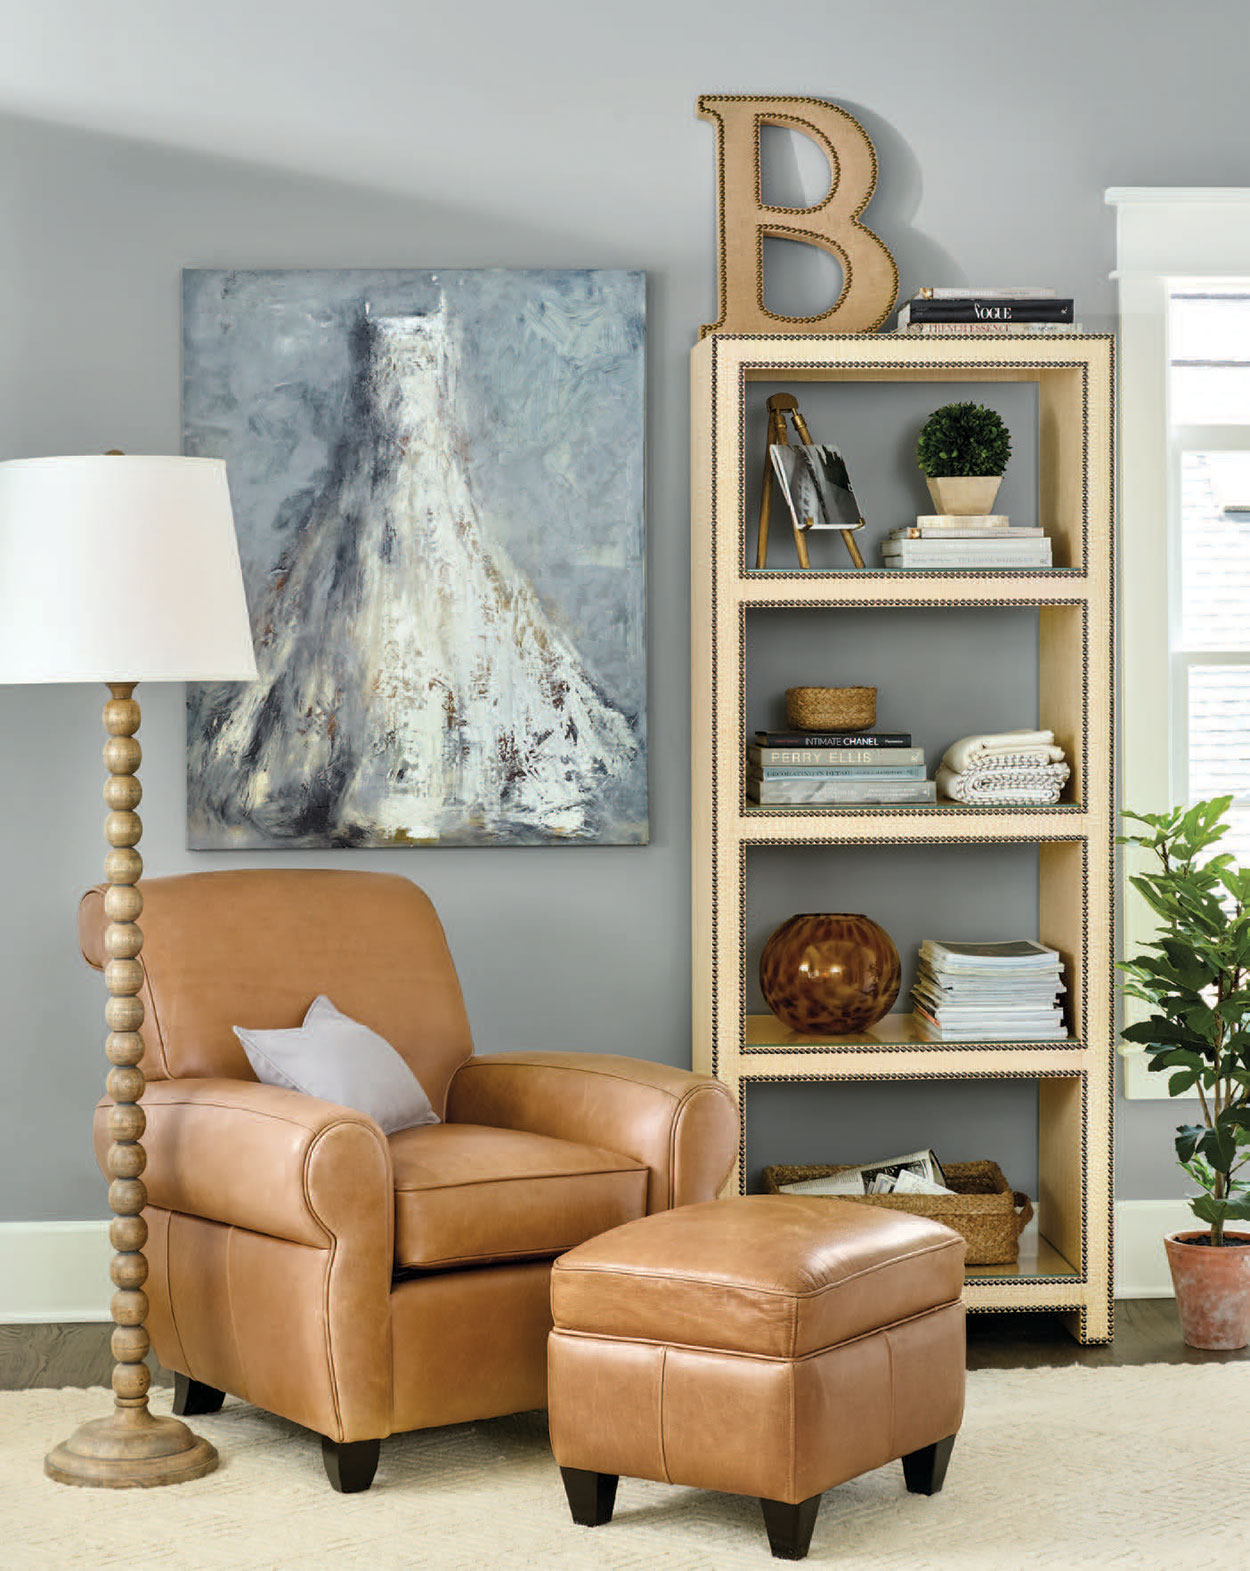 bookshelf-styling-with-ballard-designs